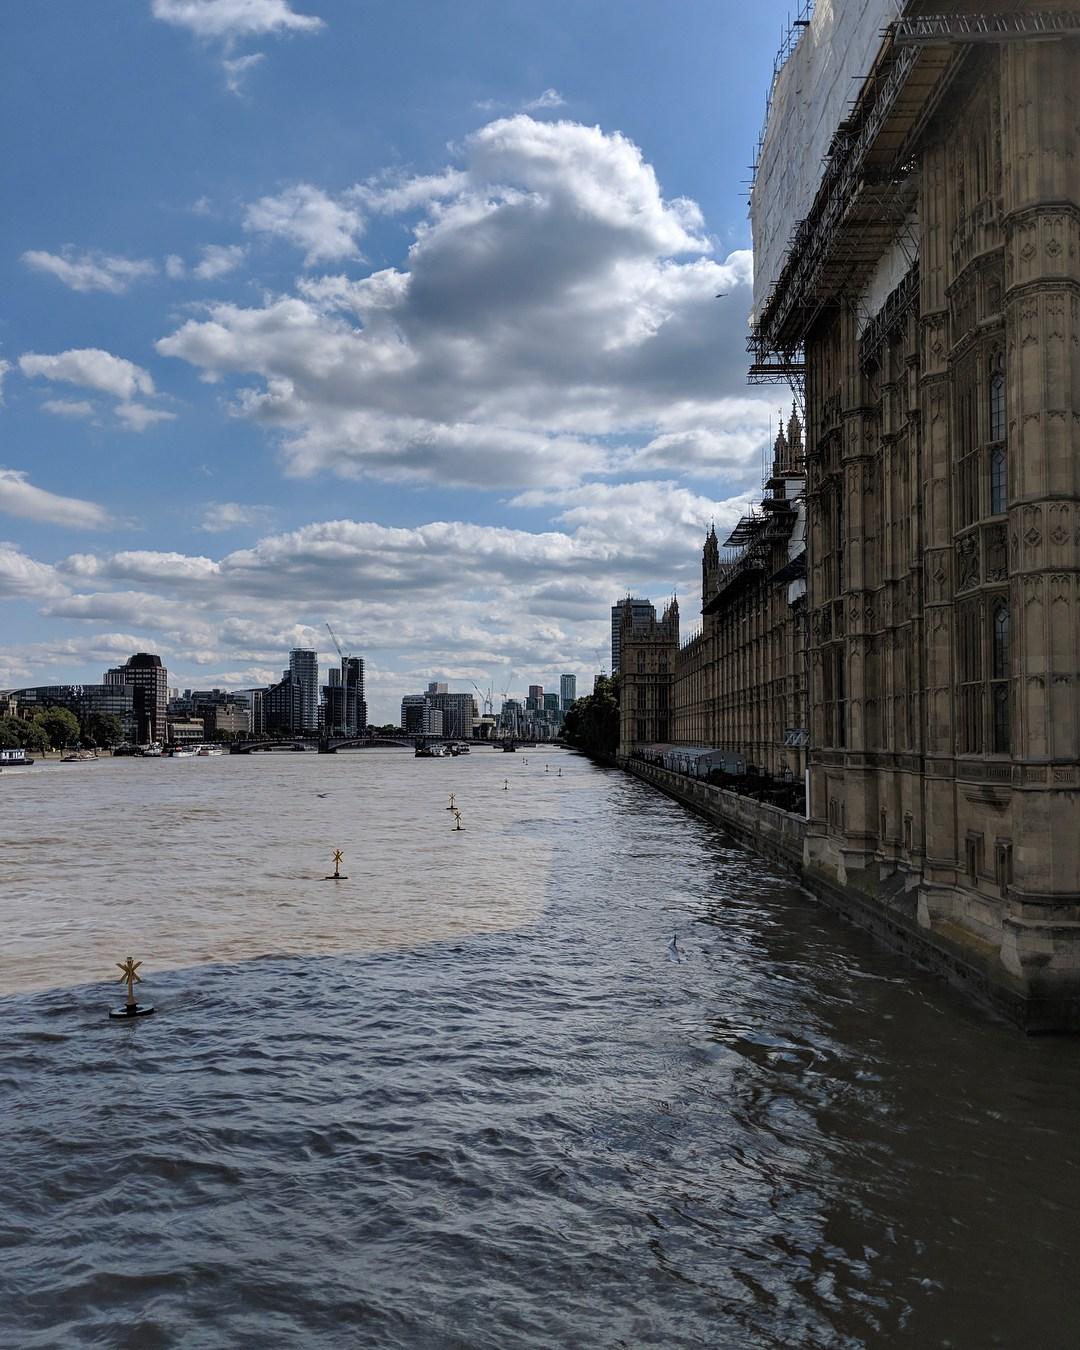 Google Pixel 3 XL camera samples London 6 - تسريب صور يزعم أنها ملتقطة بواسطة كاميرا بكسل 3 XL المرتقب إطلاقه أكتوبر القادم